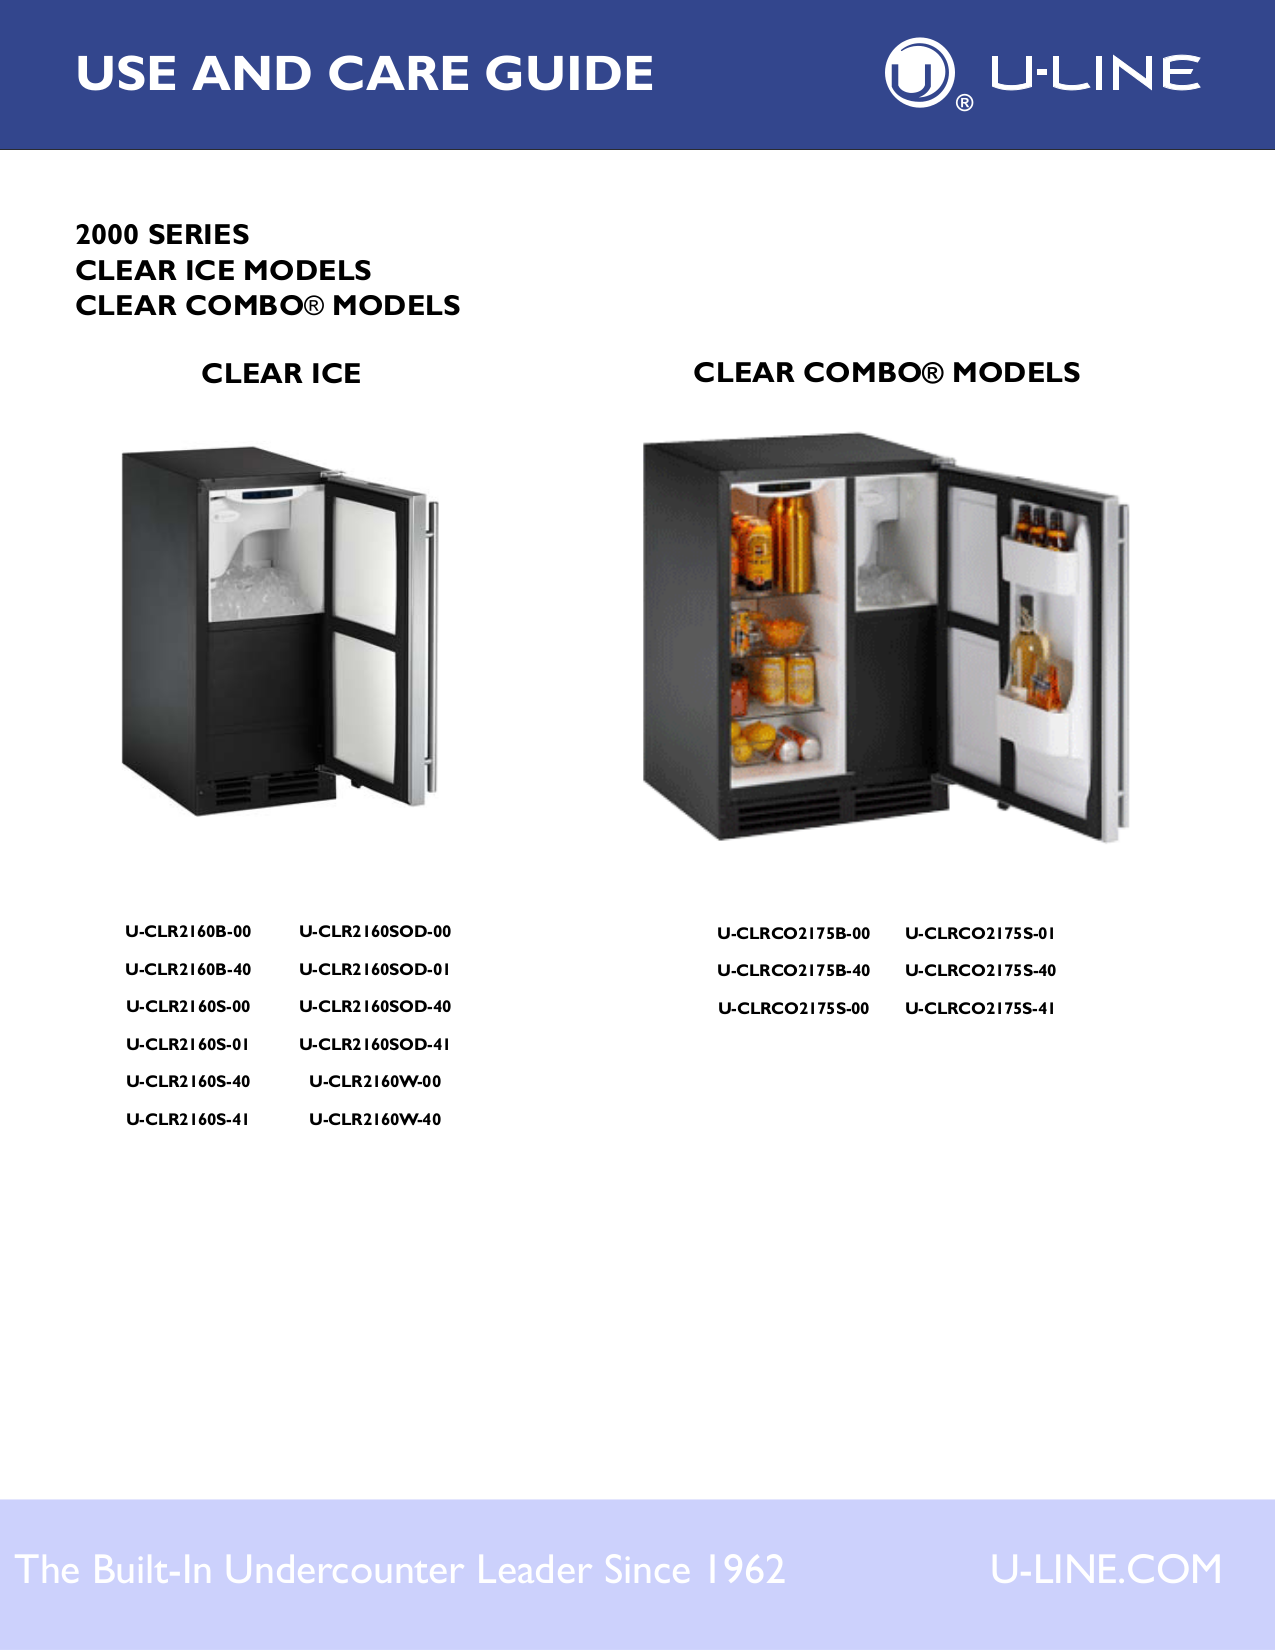 pdf for U-Line Refrigerator Echelon CO2175FS00 manual